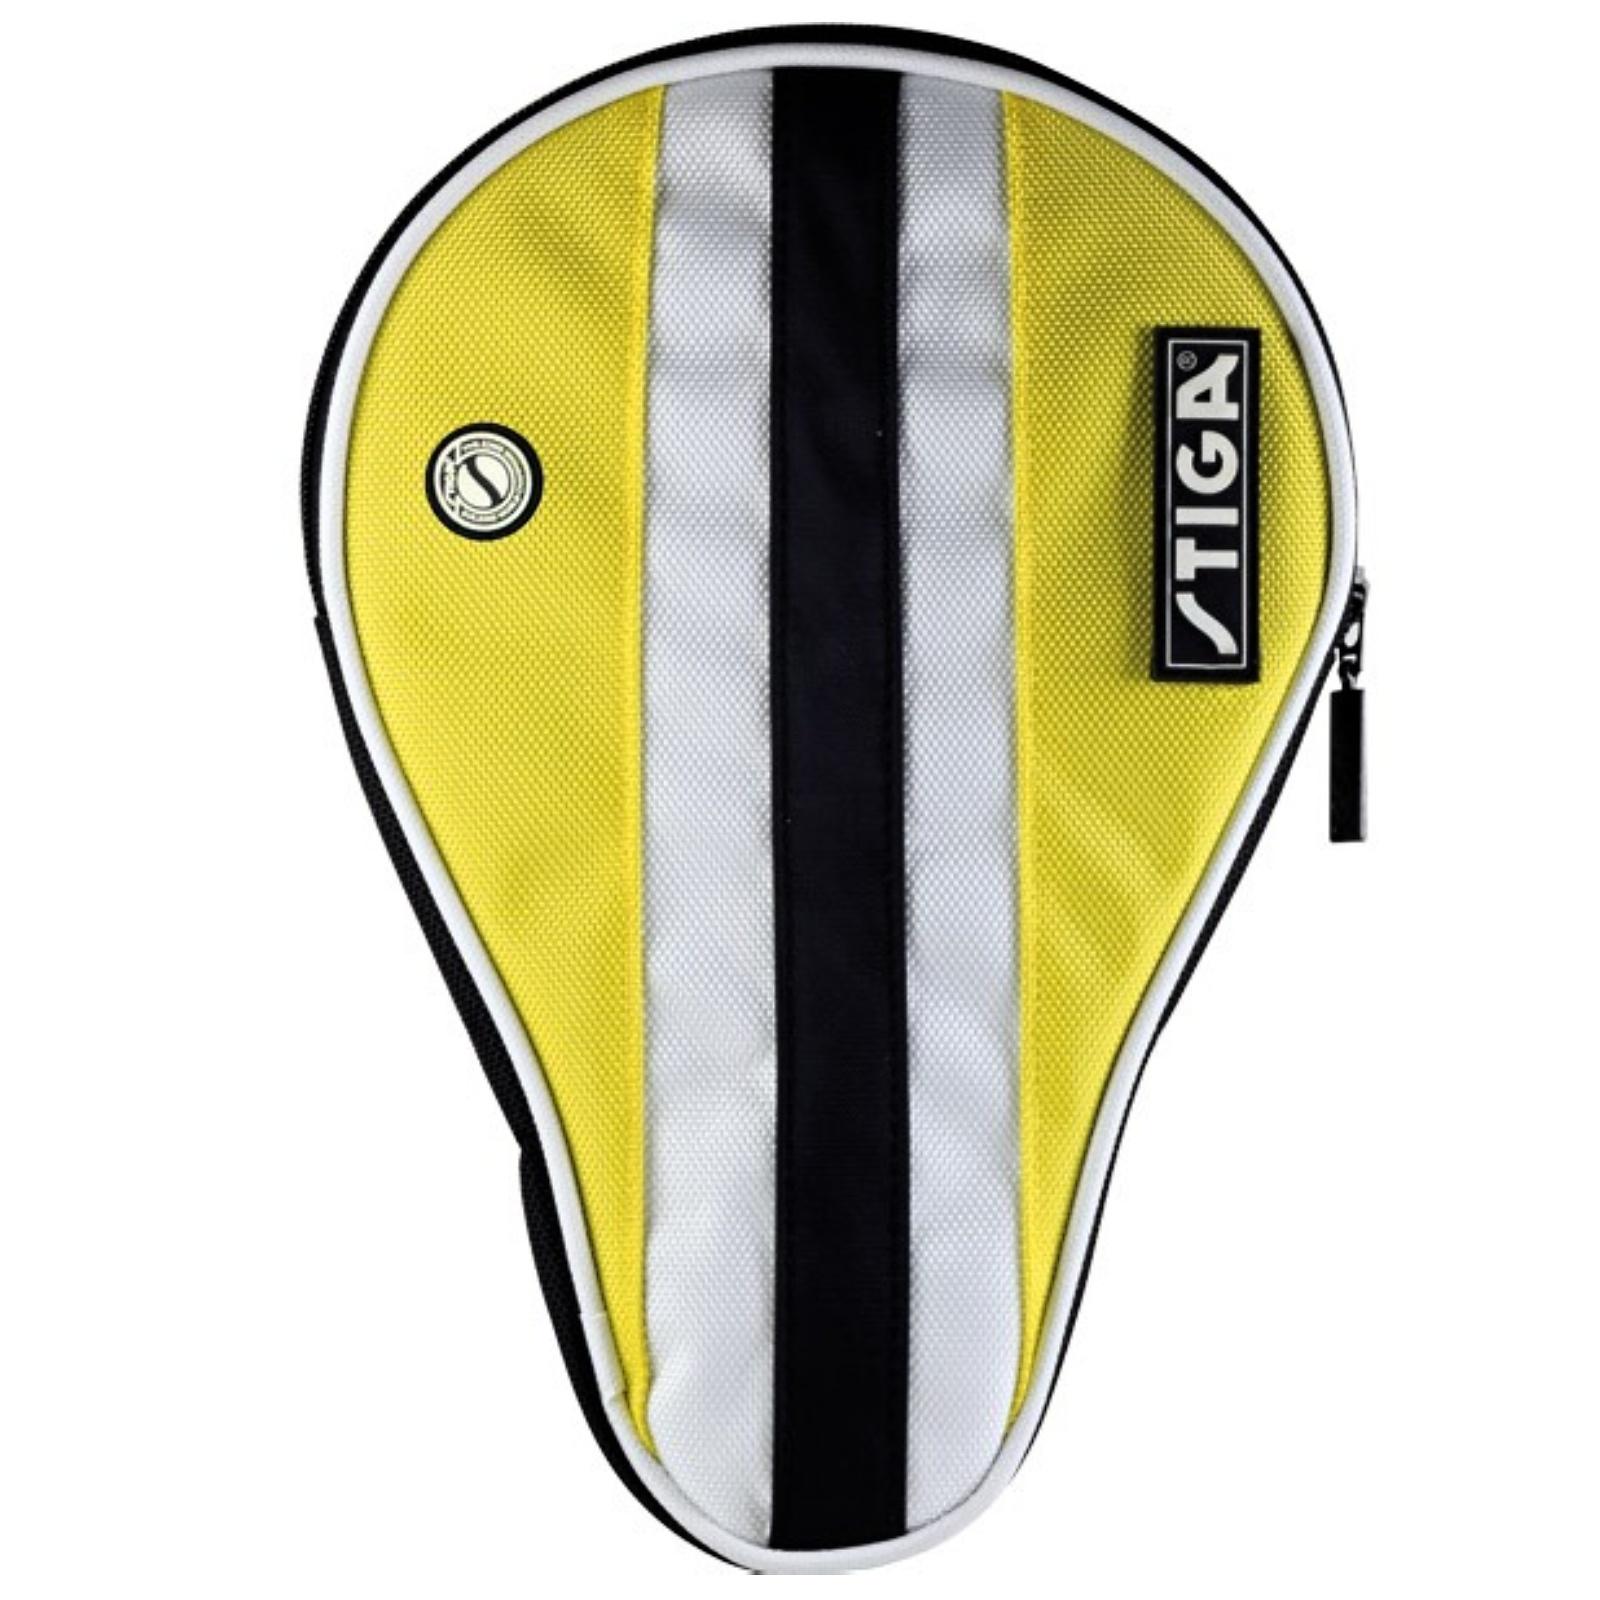 Obal na pálku na stolní tenis STIGA Line obrys - žlutý